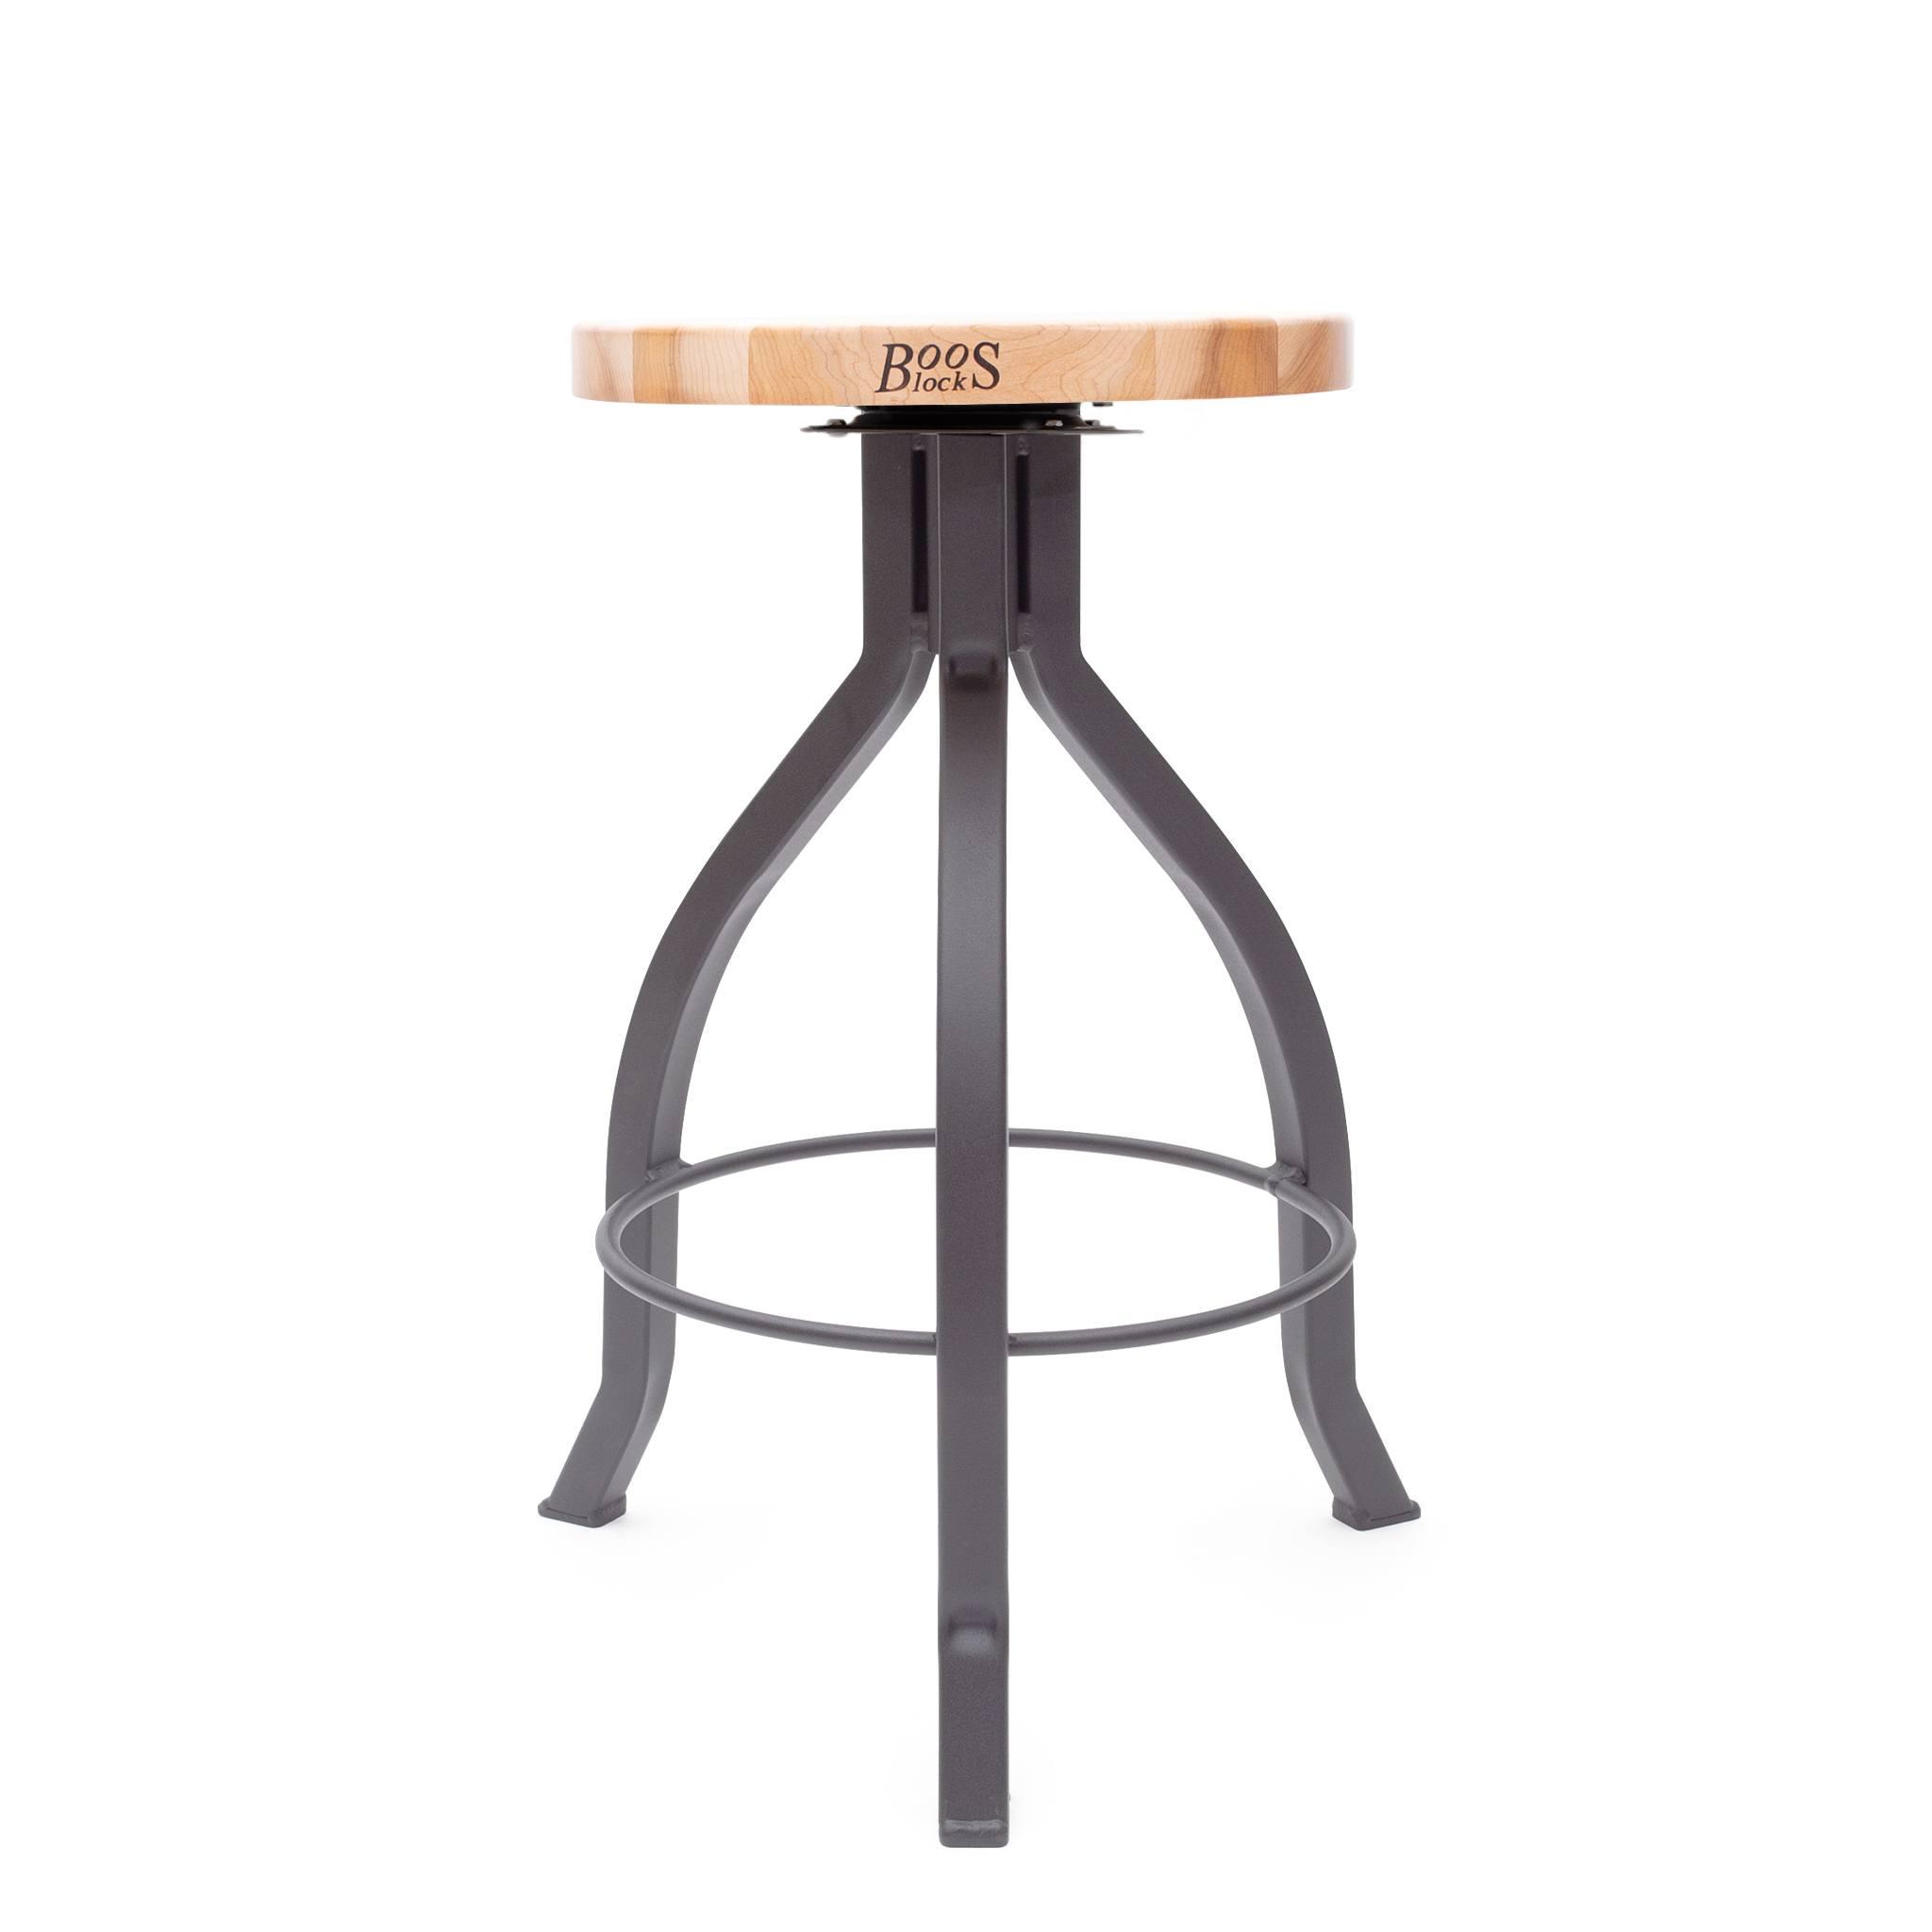 John Boos Maple Counter-Height Table - 36